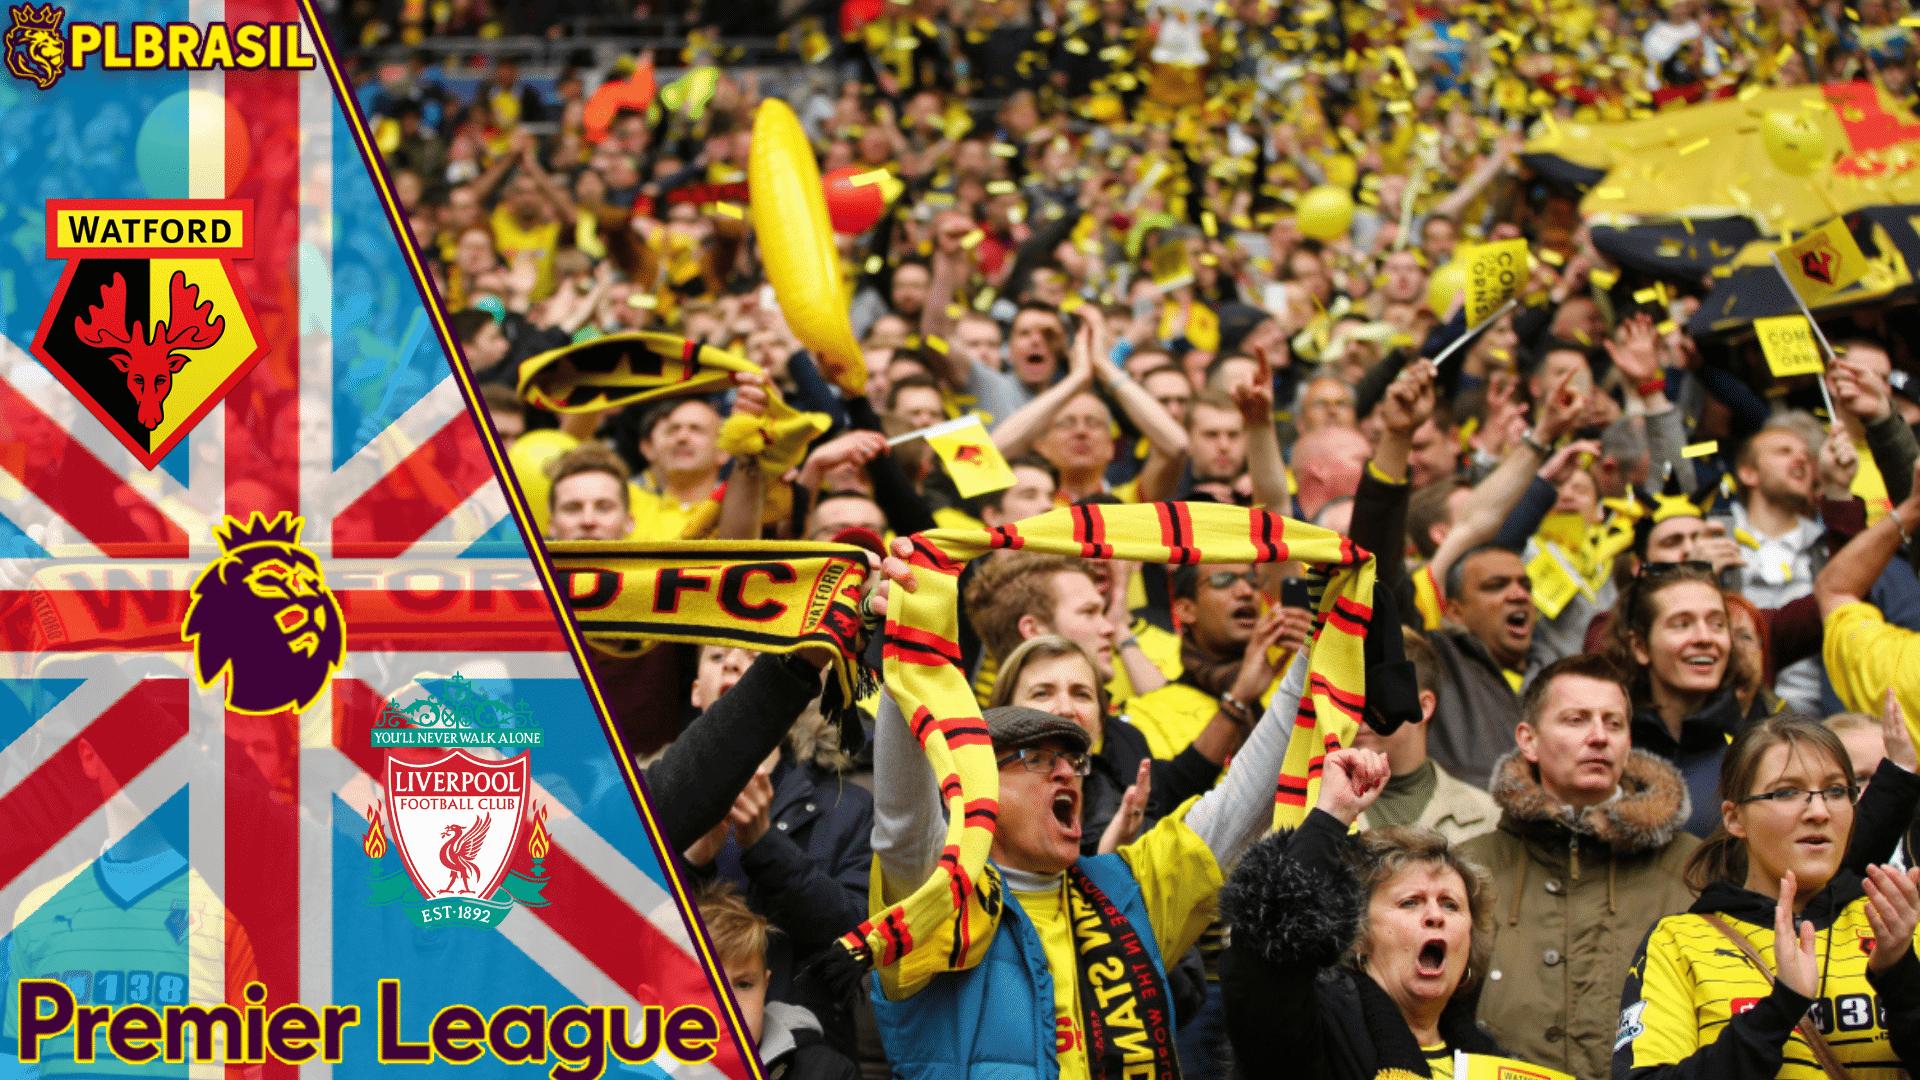 Watford x Liverpool